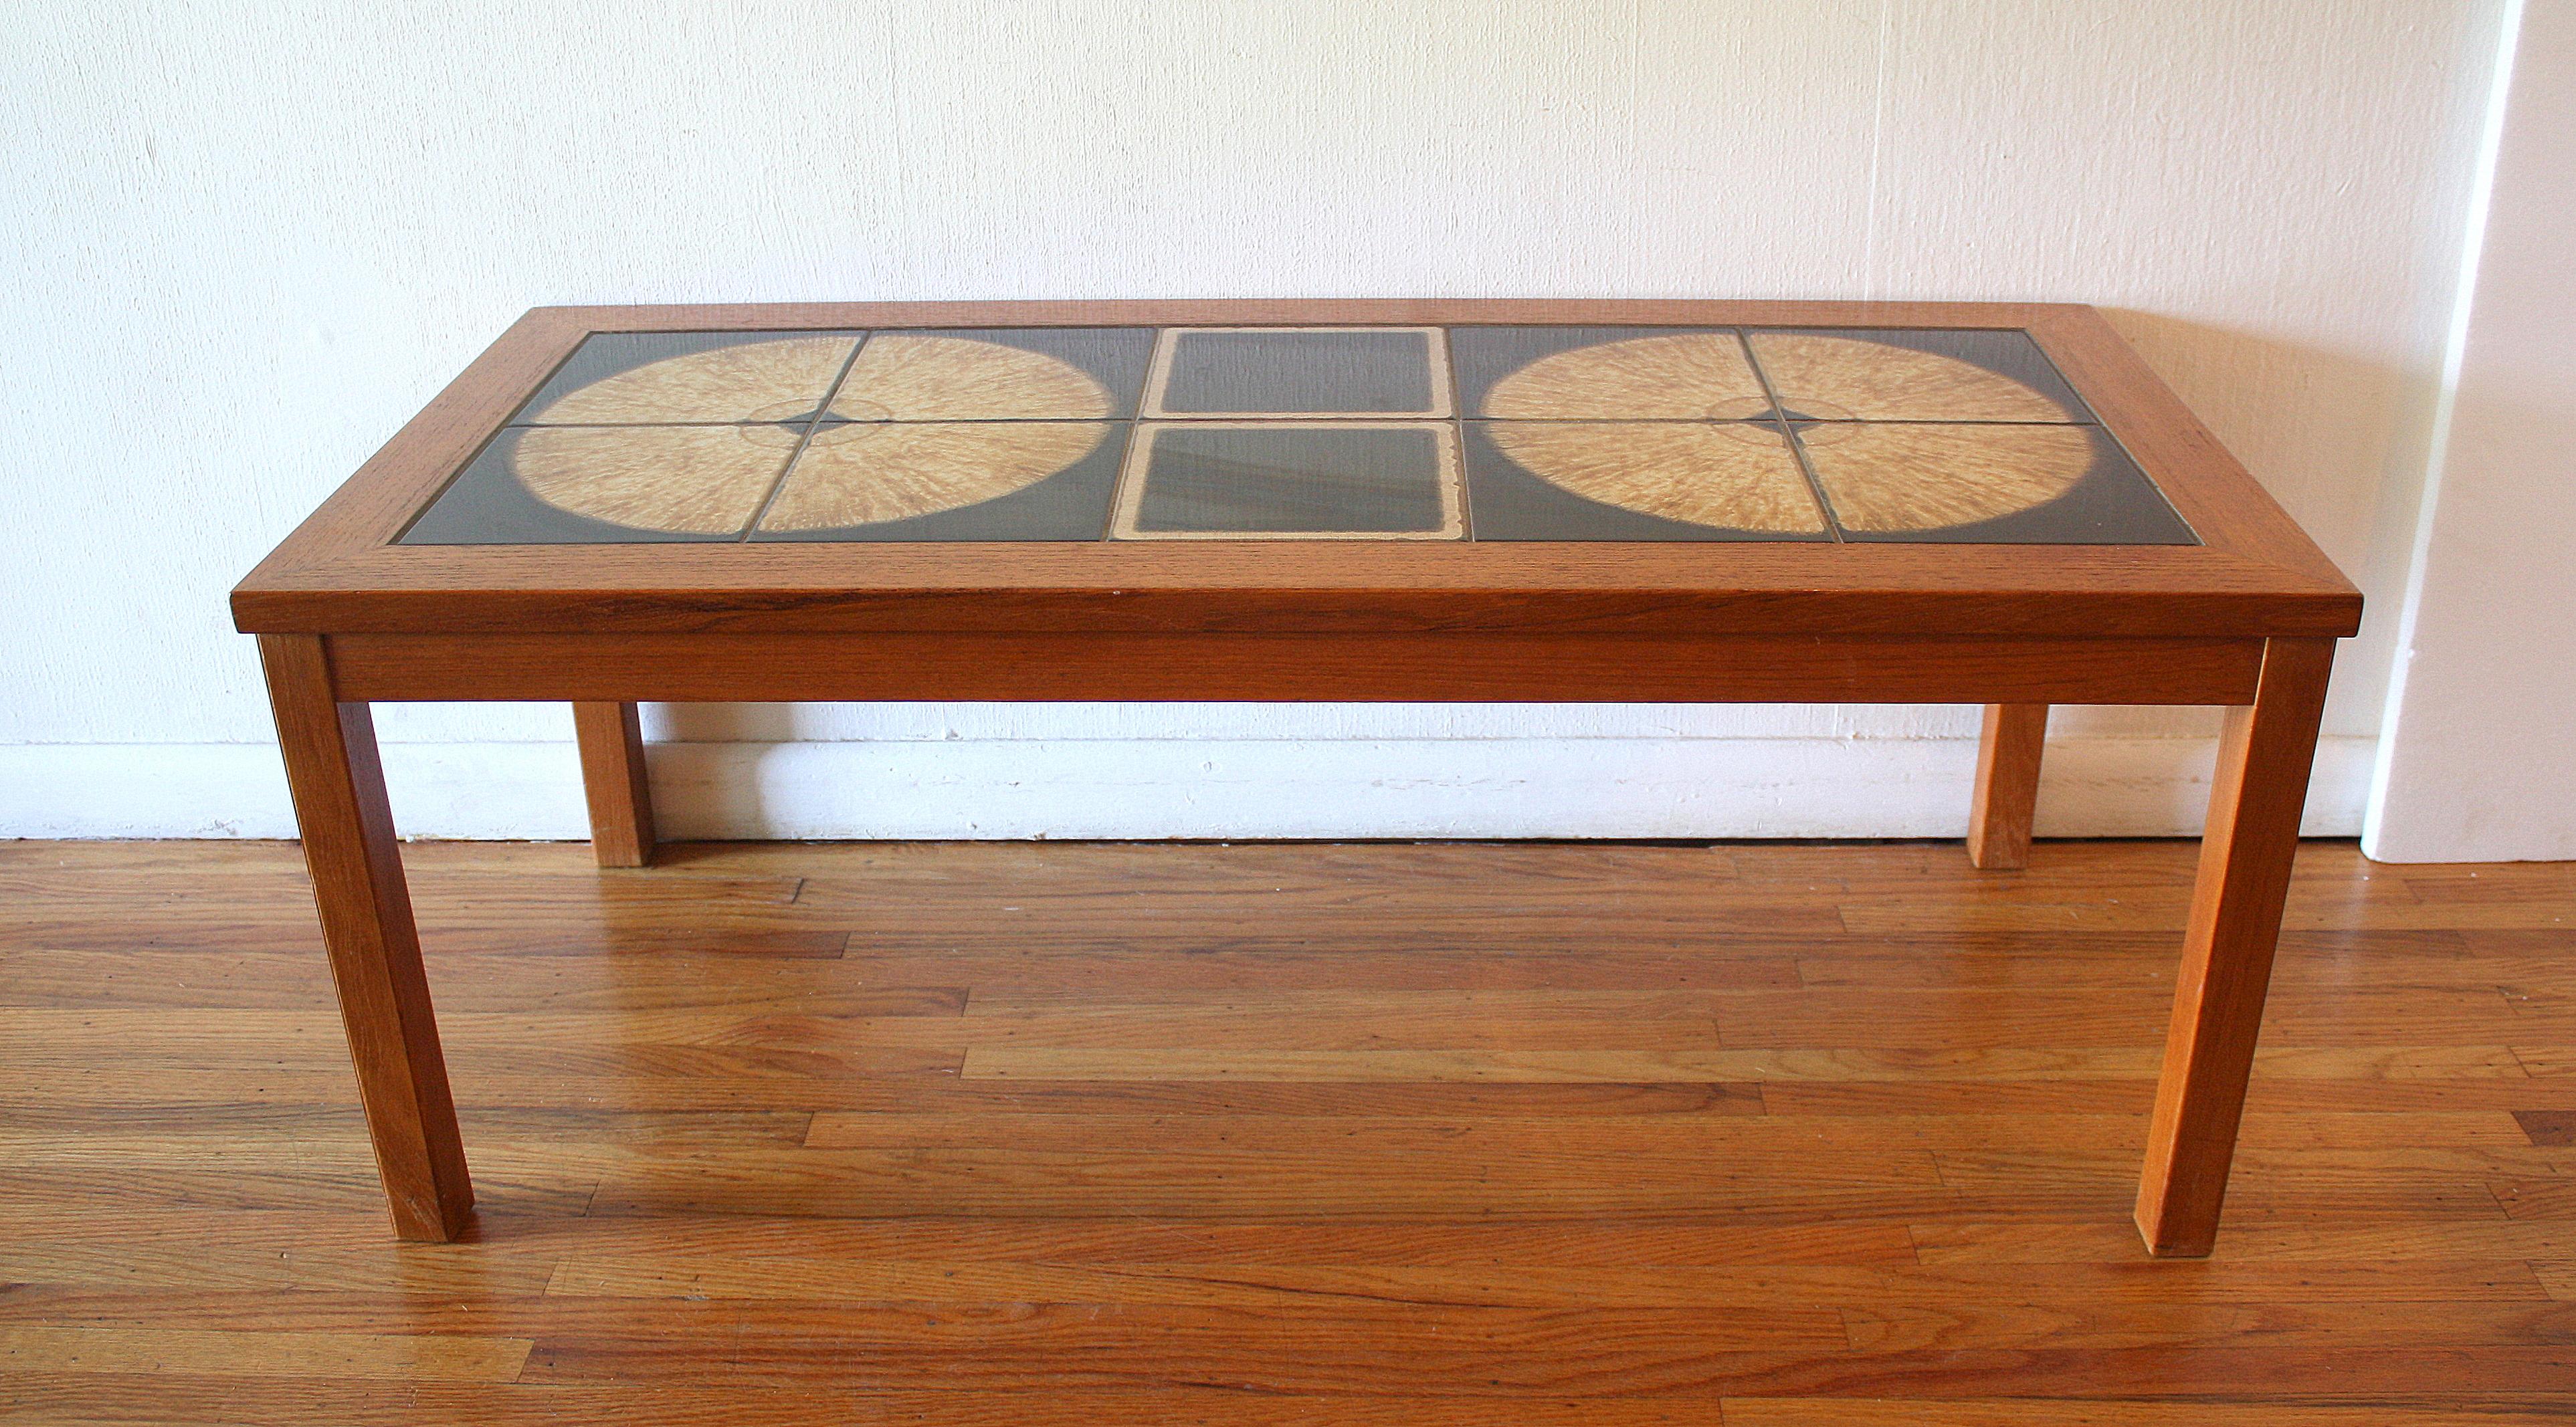 Merveilleux Danish Teak Tile Coffee Table 2